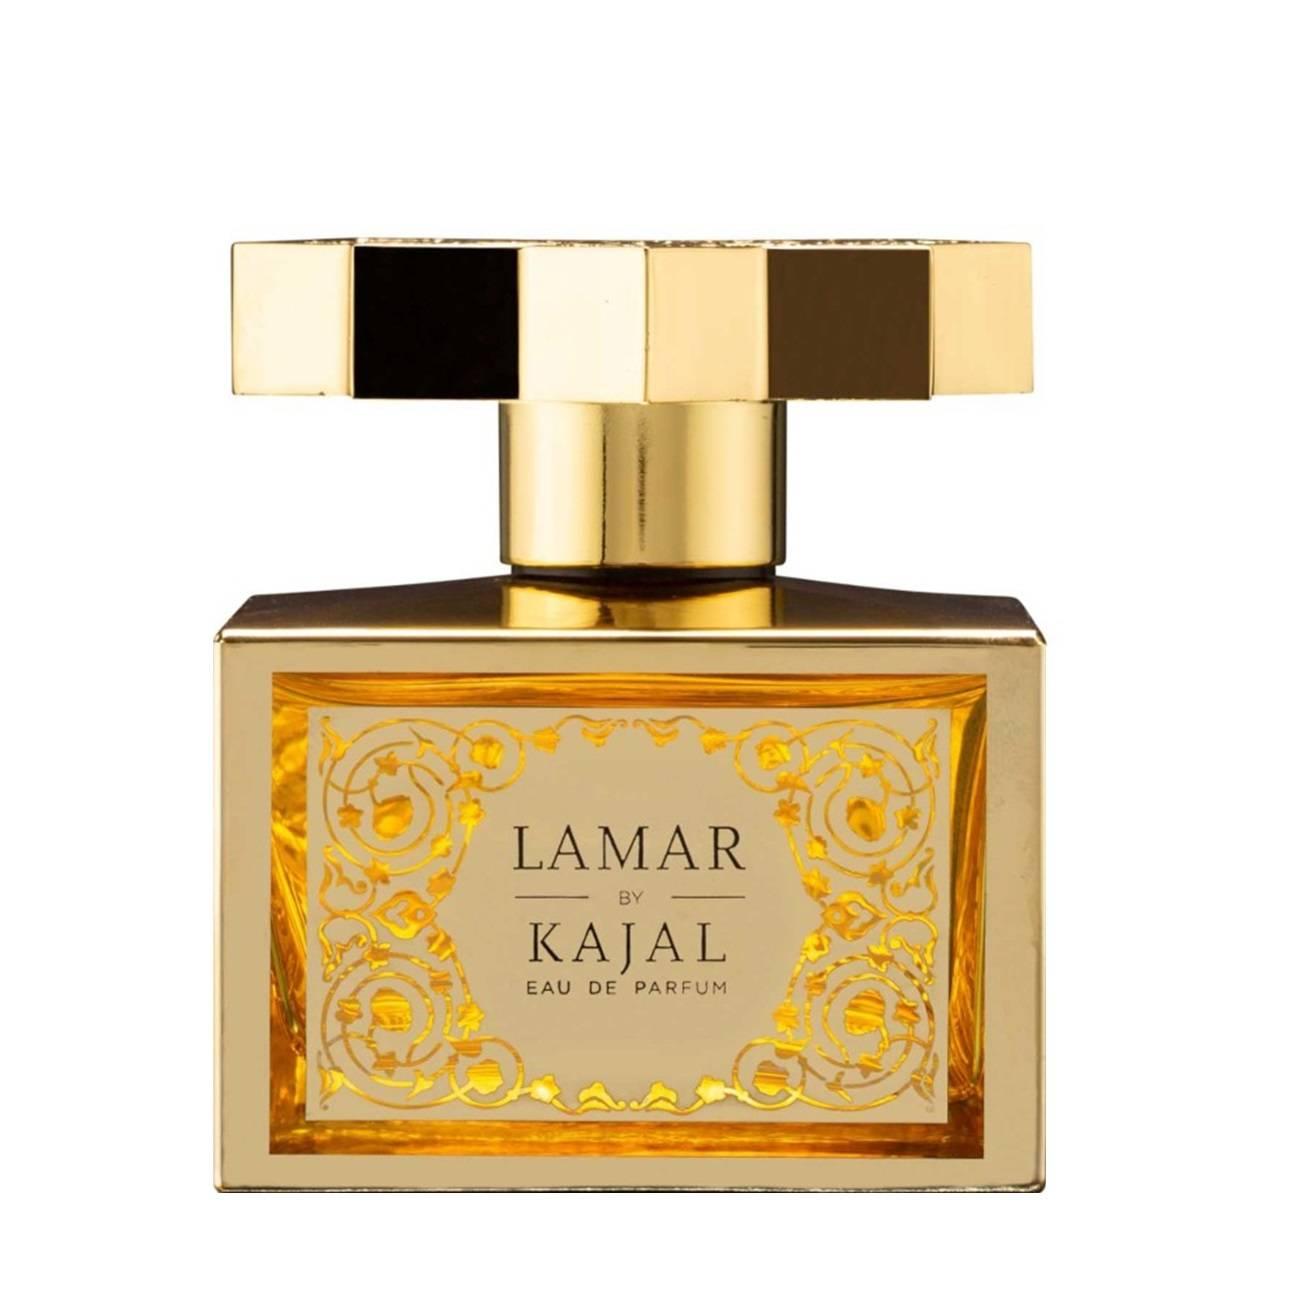 Lamar By Kajal imagine